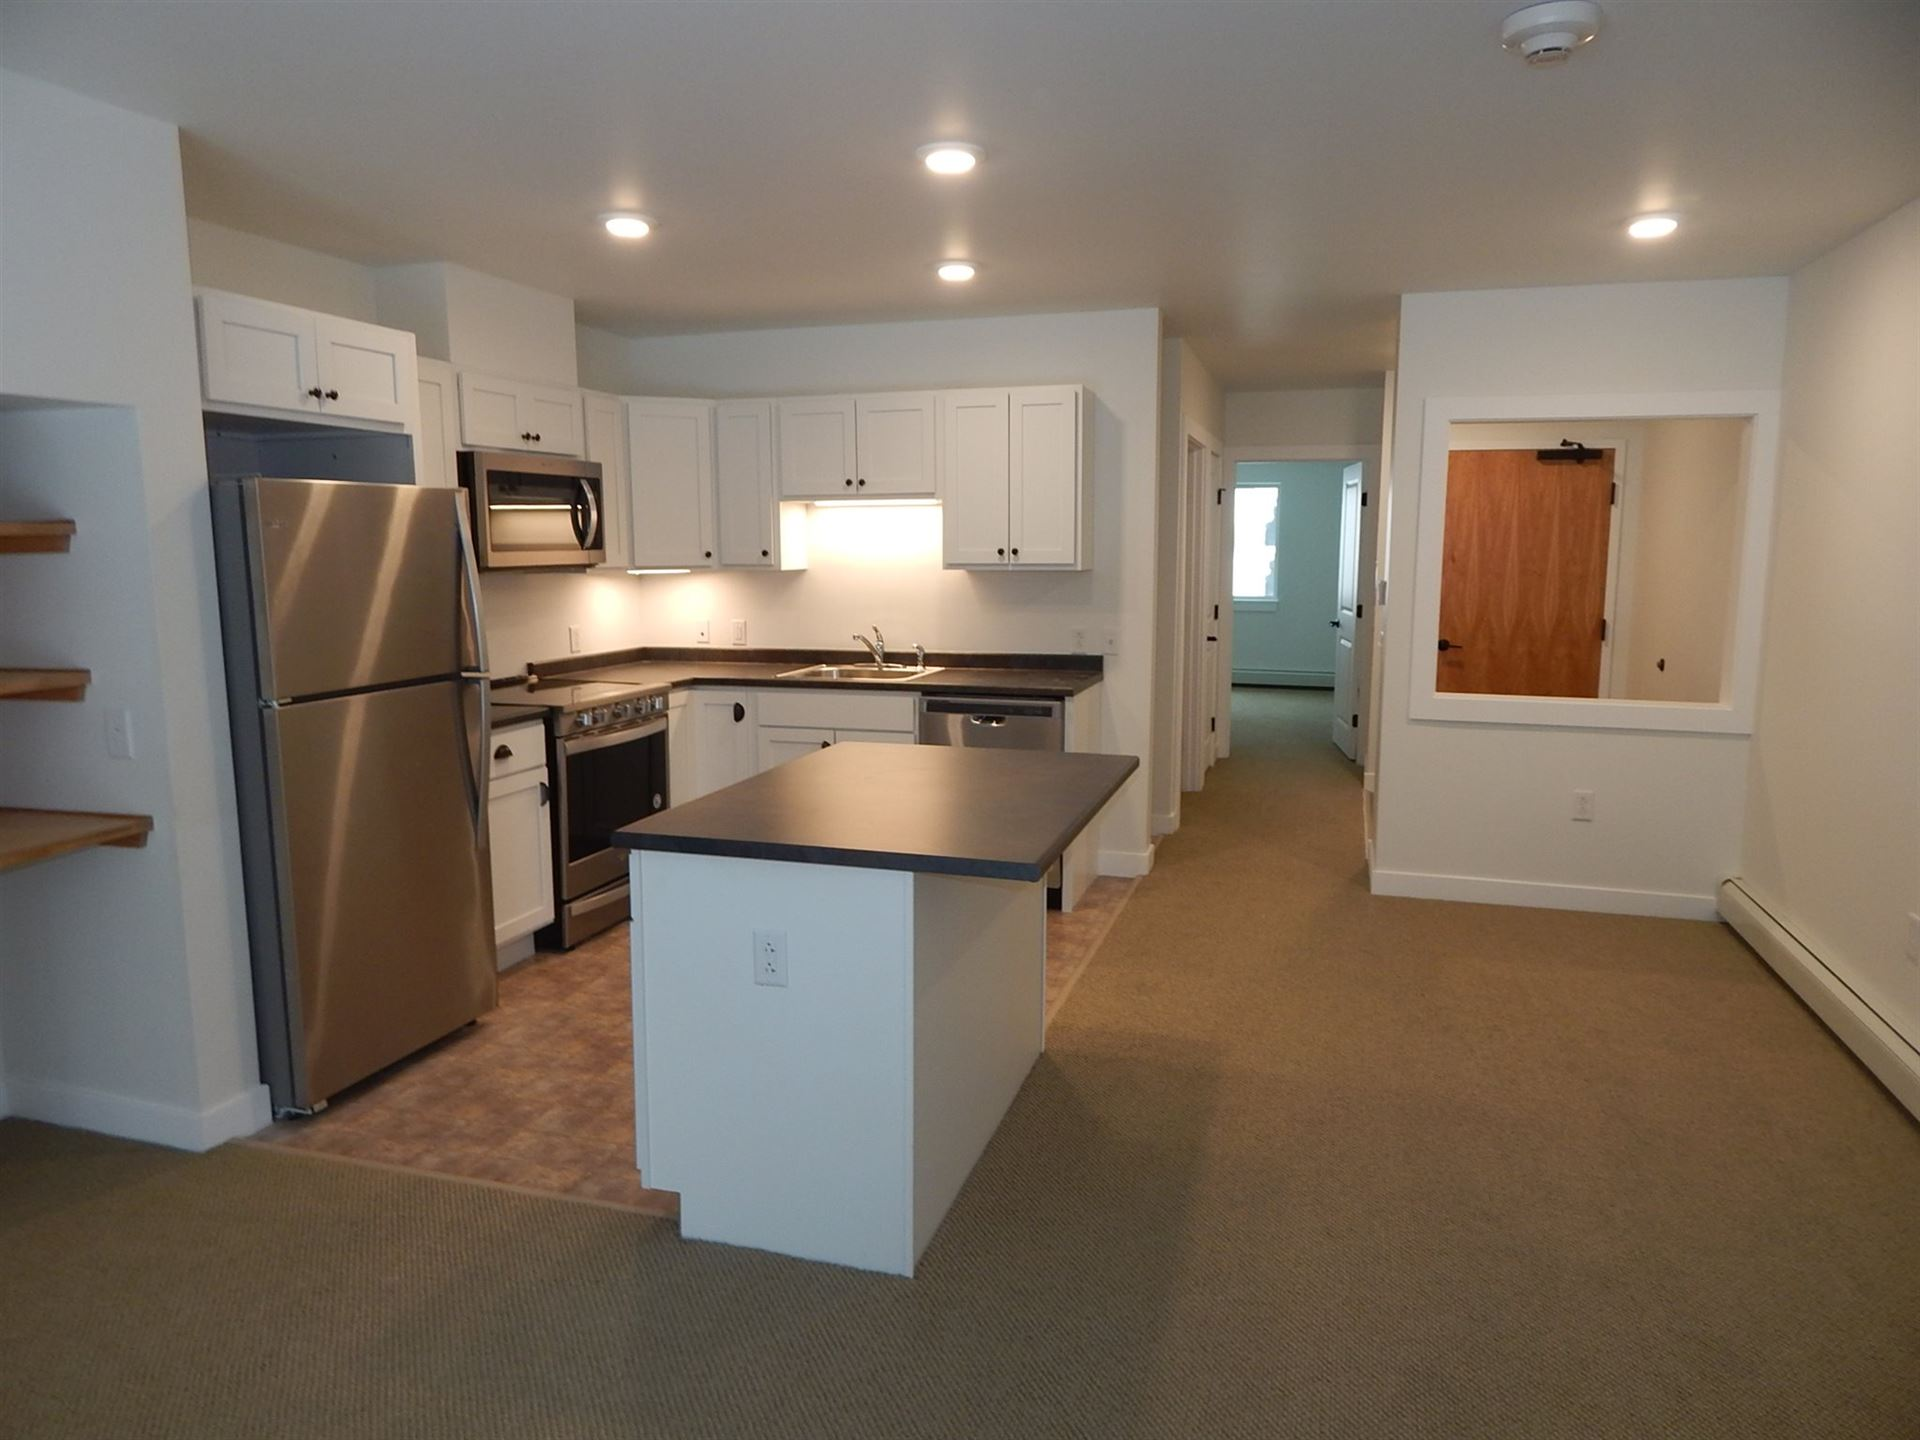 251 Mountainside Drive #69, Warren, VT 05674 - MLS#: 4846274